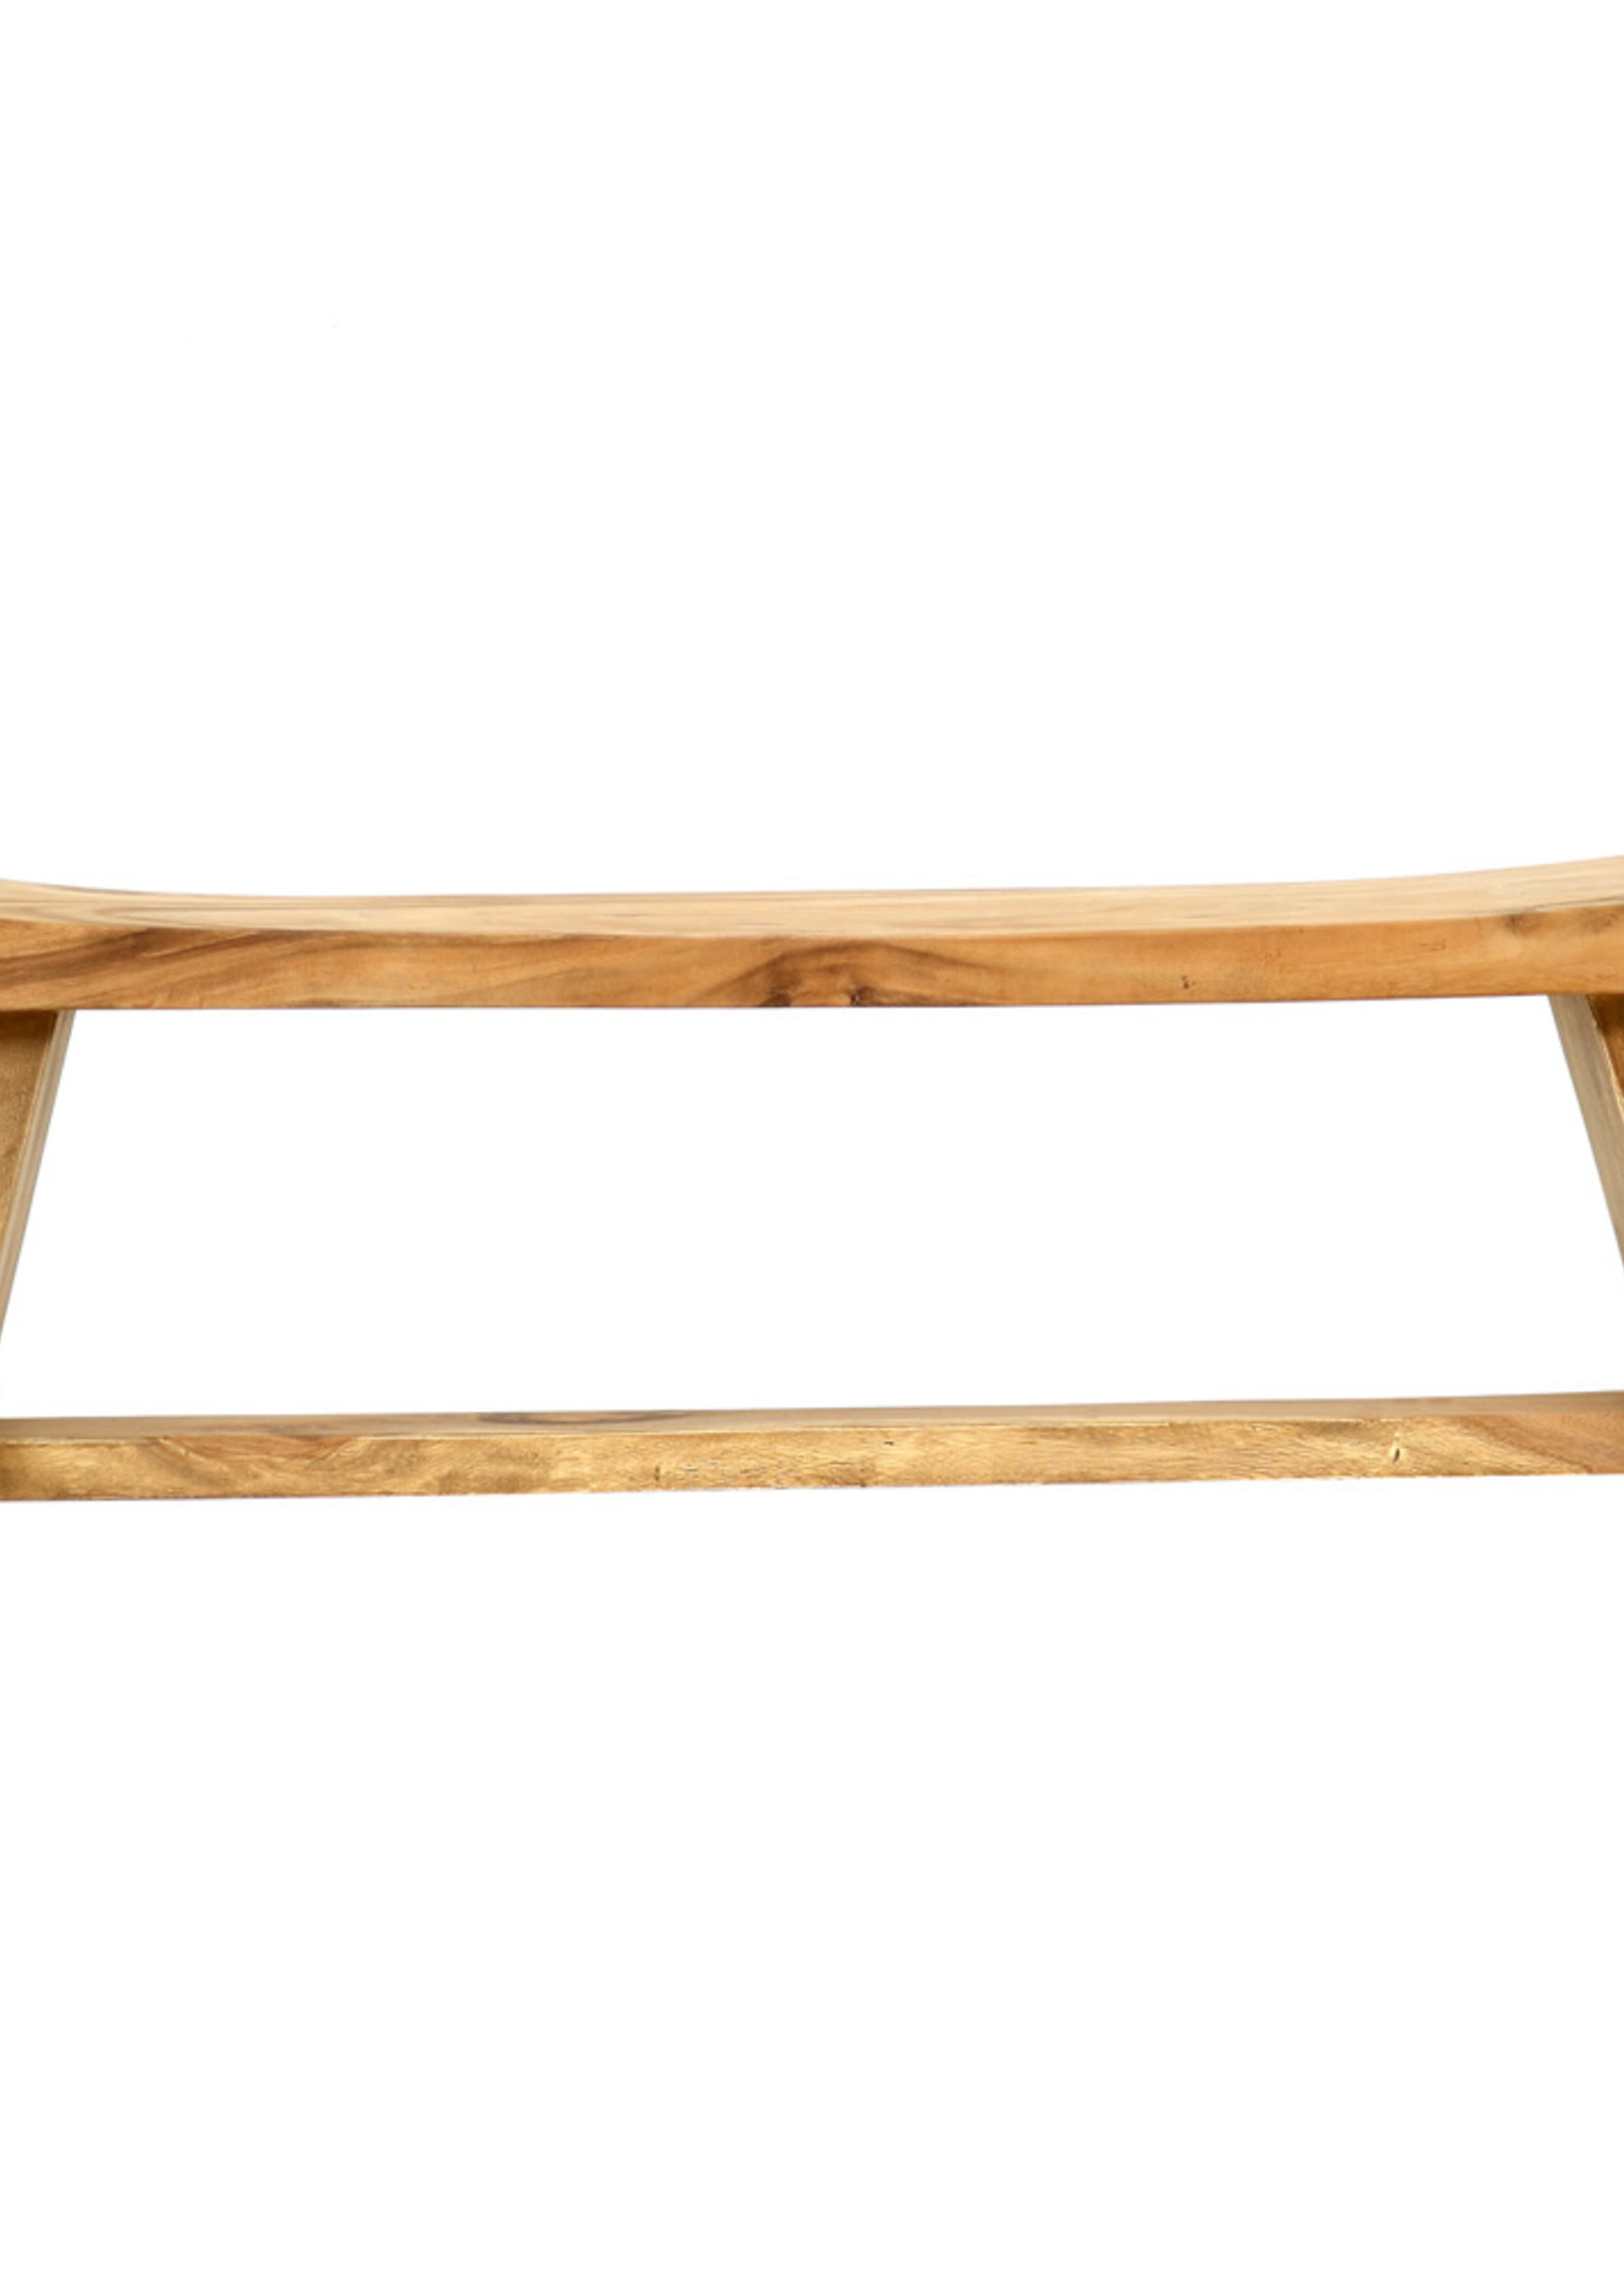 The Suar Bench - Natural - 120